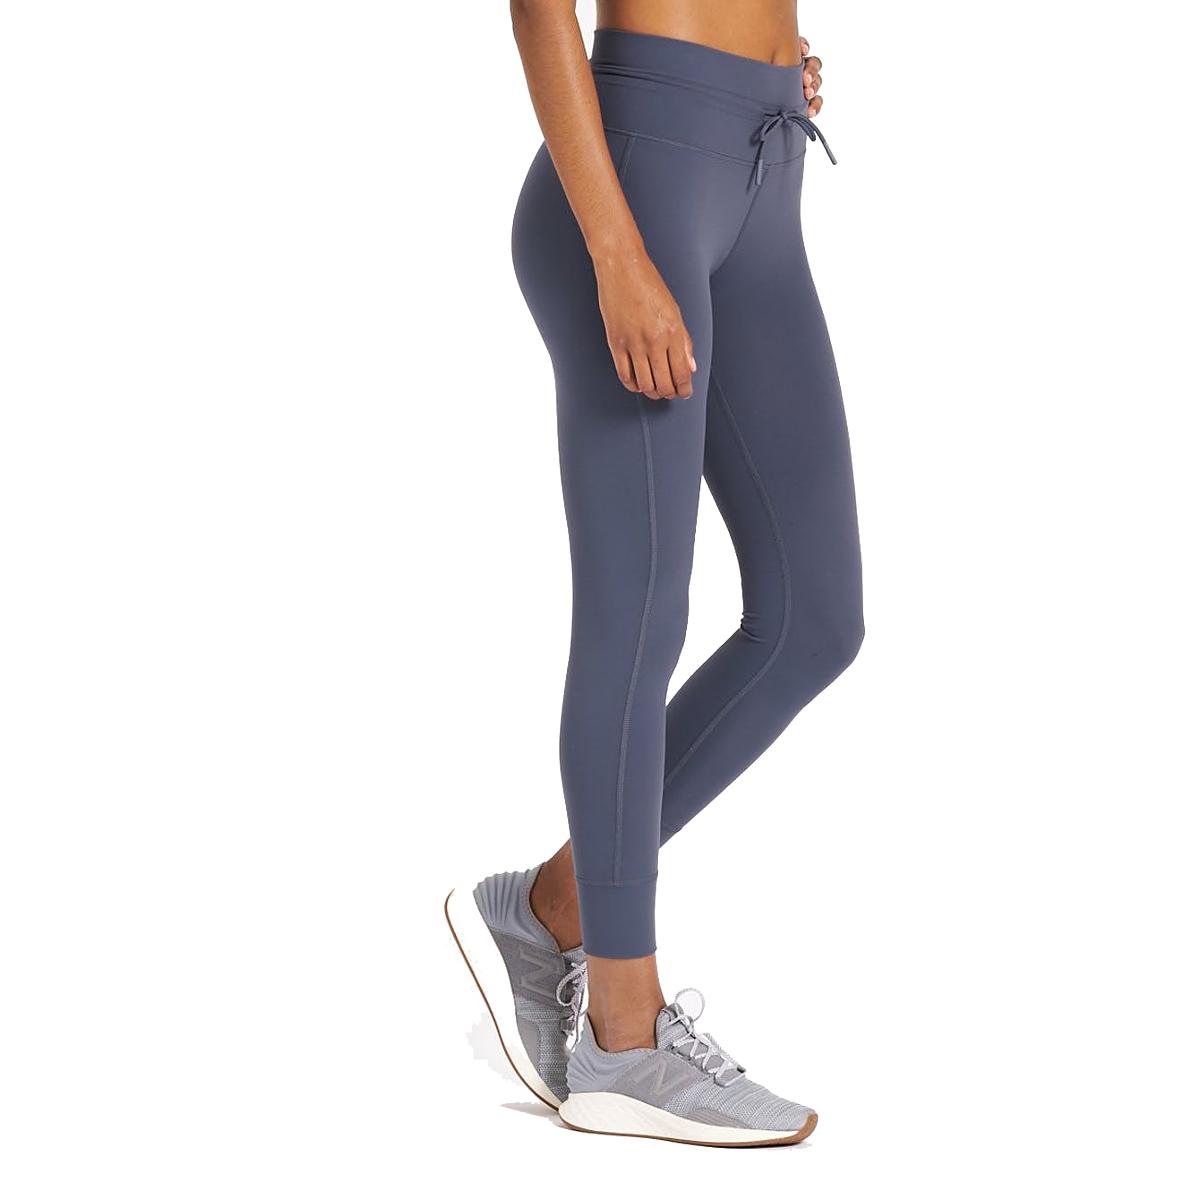 Women's Vuori Daily Legging  - Color: Ocean - Size: M, Ocean, large, image 2